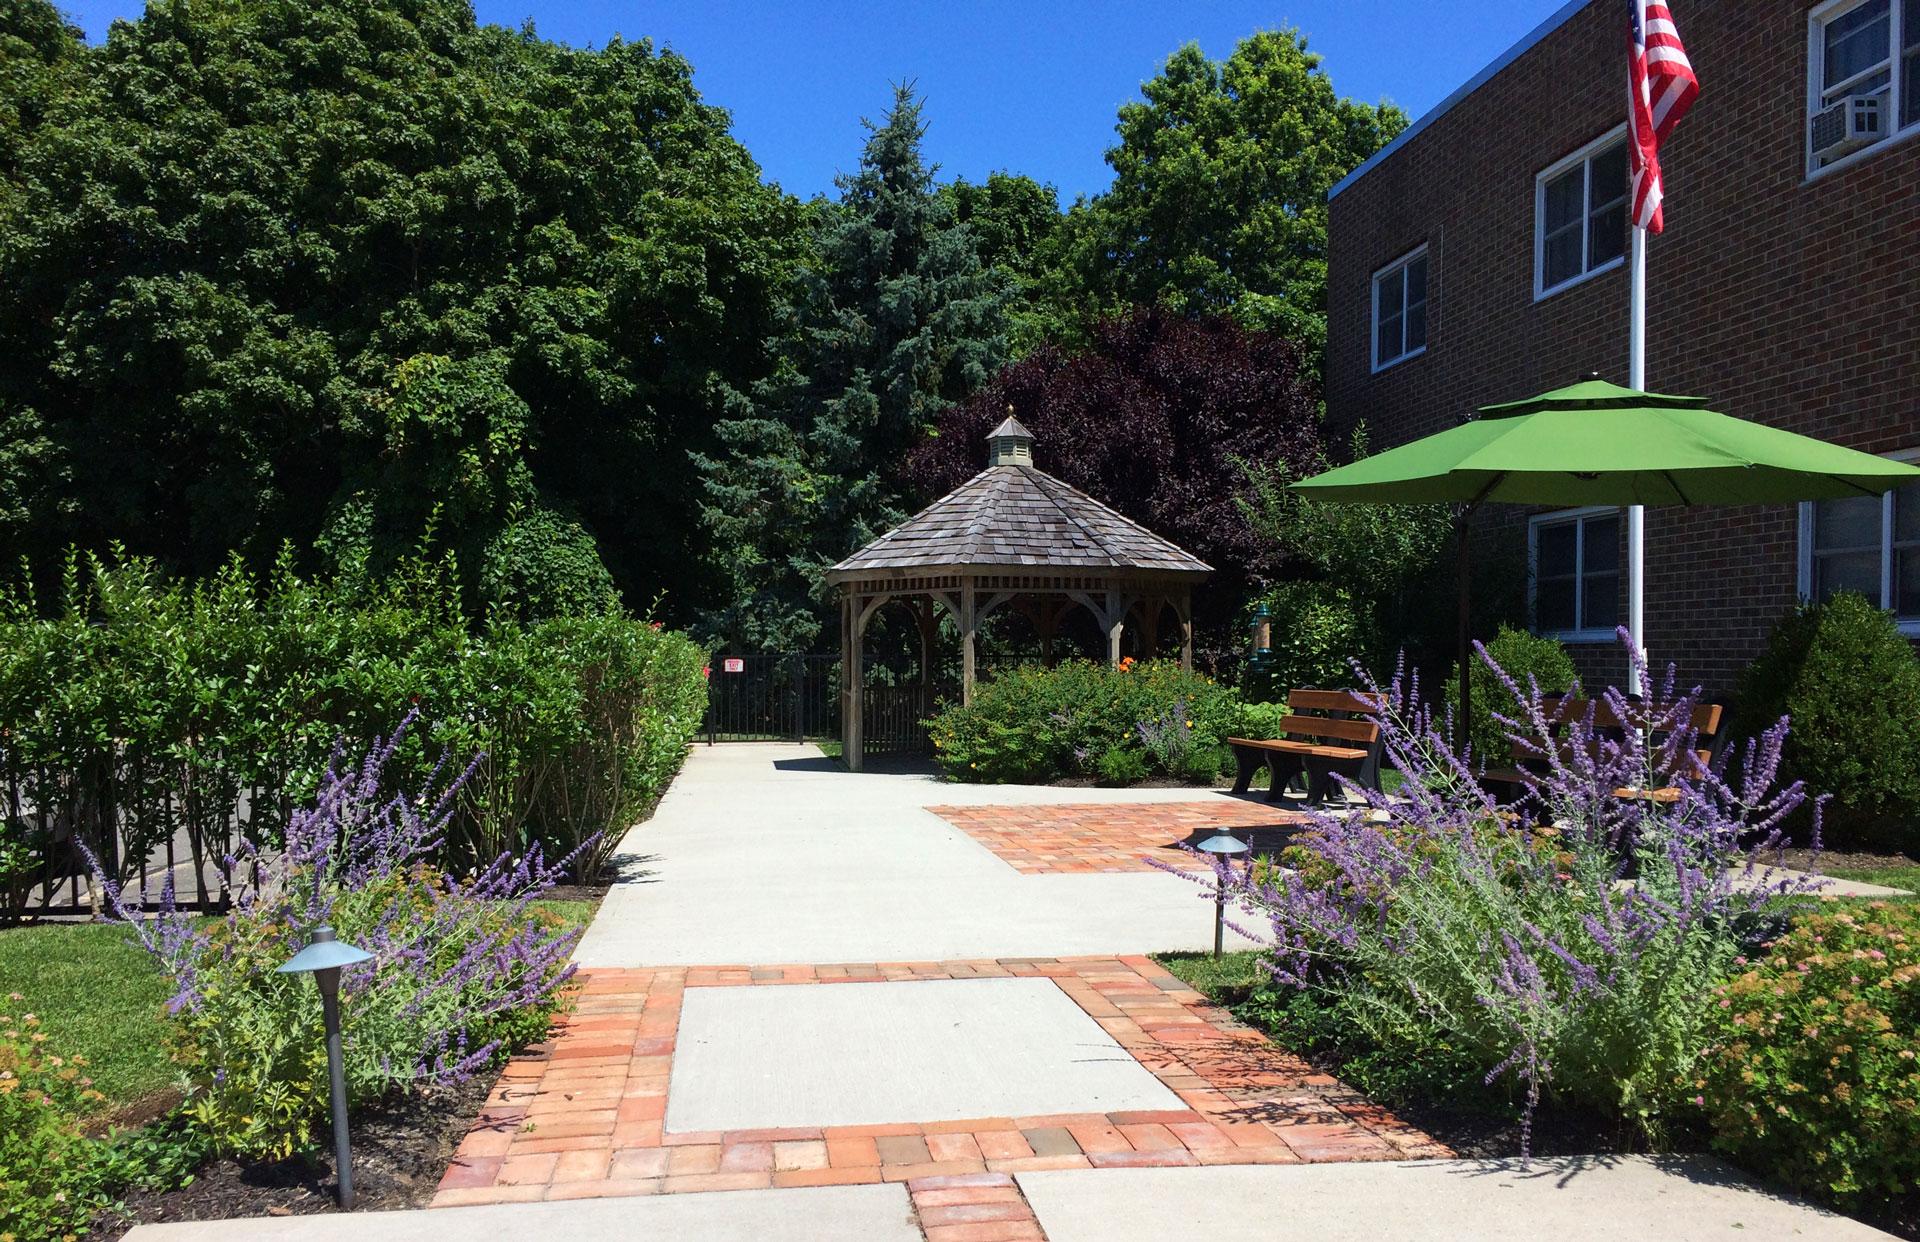 Patio next to the garden at San Simeon